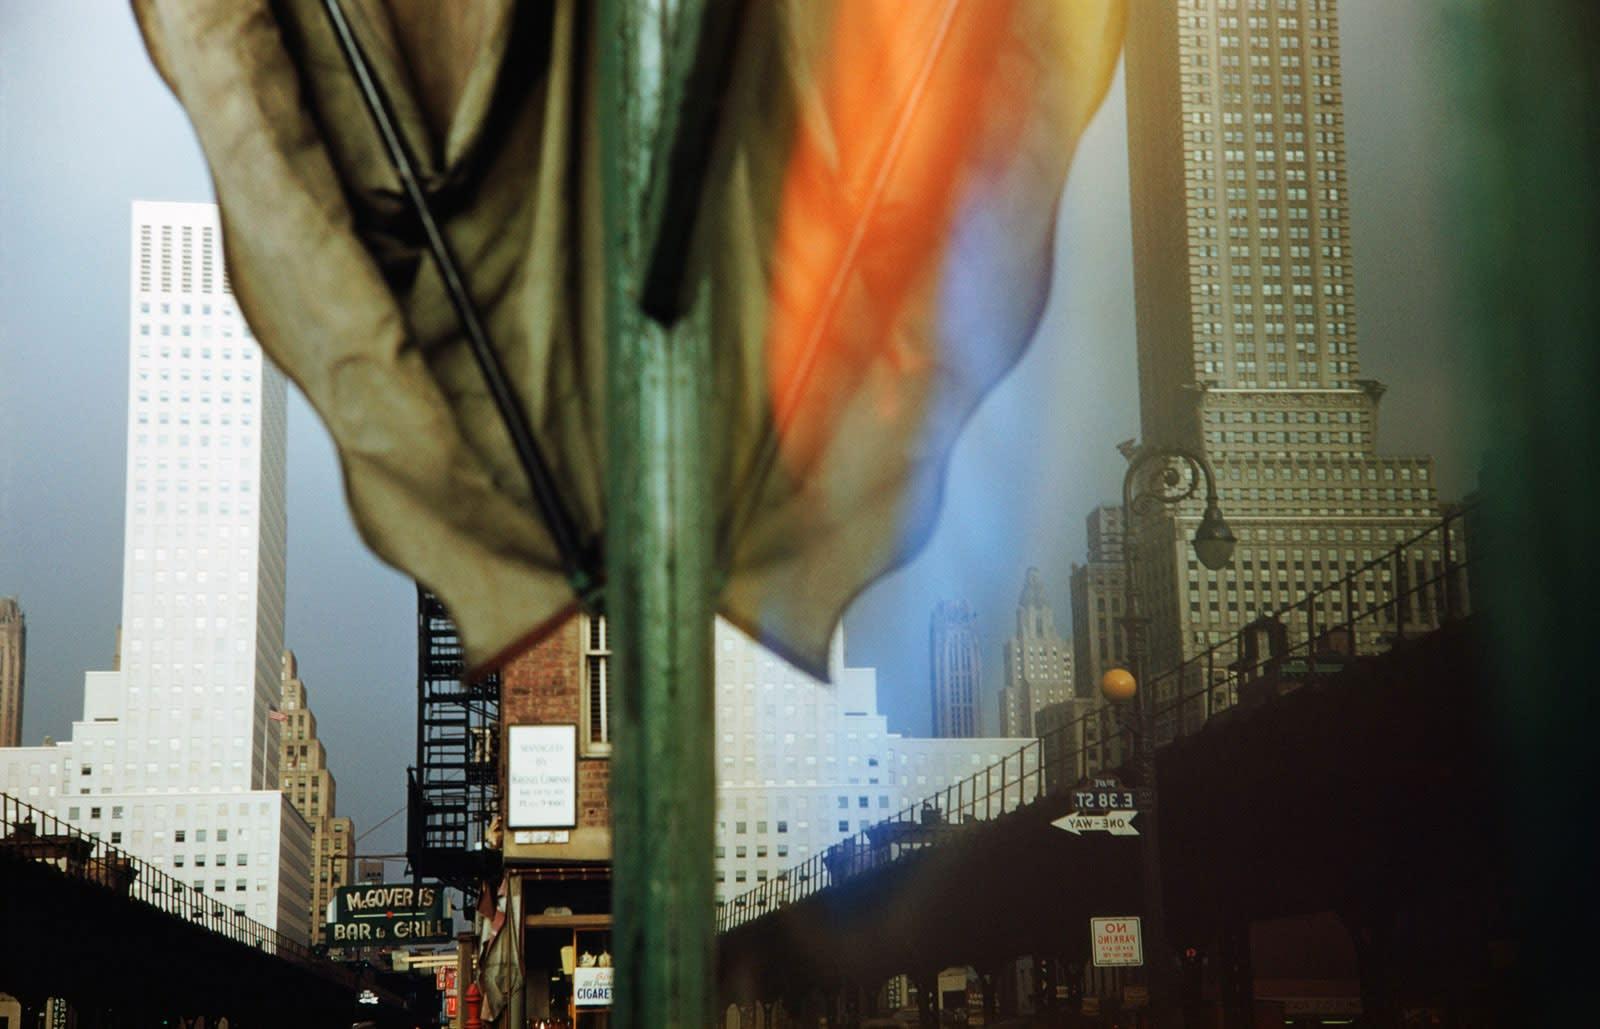 Ernst Haas Third Avenue Reflection, New York City, USA Tirage chromogène posthume 57,5 x 86,4 cm Dim. papier: 76 x 101,5 cm